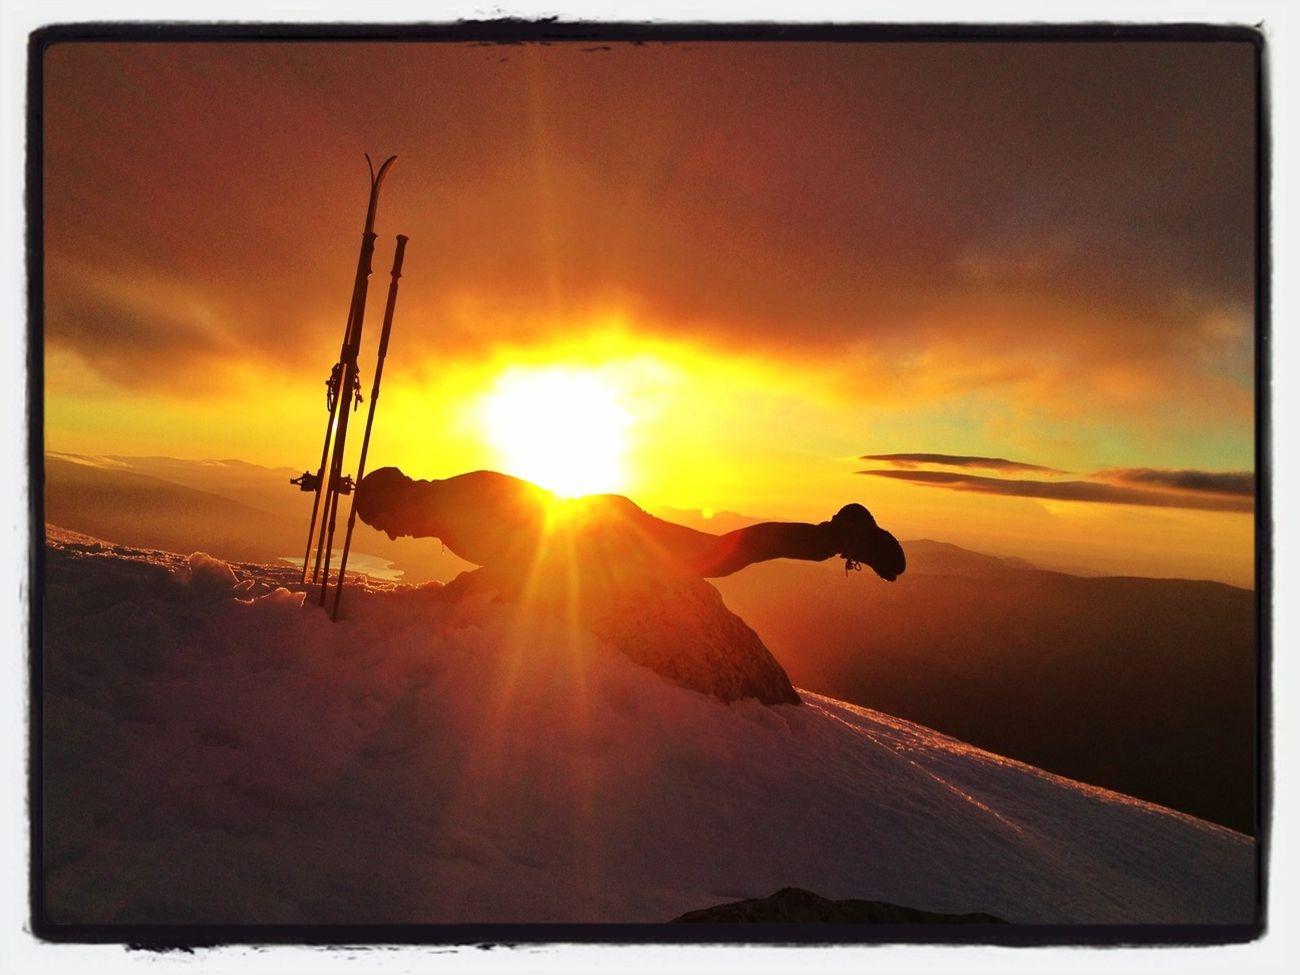 #planking Primaveral? #esquídemontaña #skimo #skimountaineering #Peñalara  #dynafit #mountain #ilovemountains #training #gasss #DynaTour #Ascent #Regram #skinning #Dynafitting #SuuntoAmbitions #primavera #spring